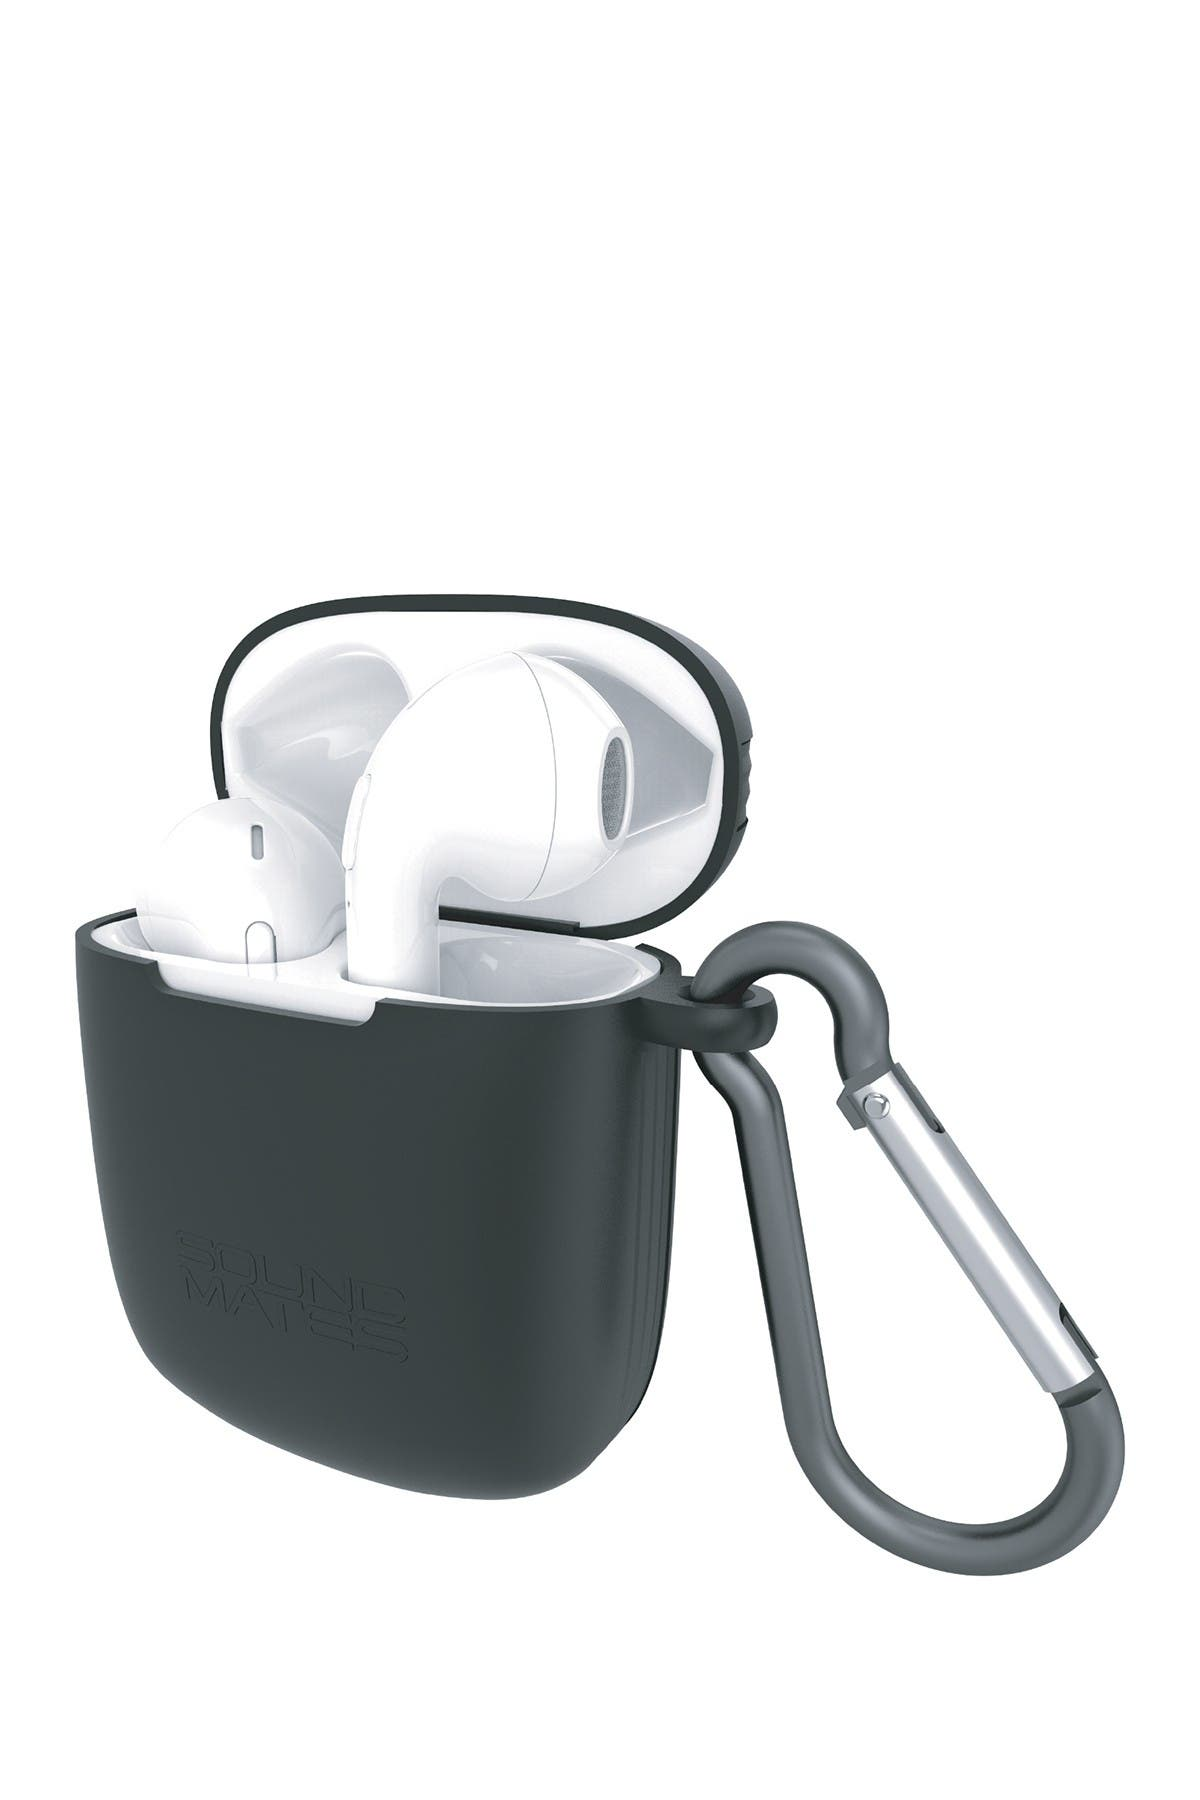 Image of Tzumi Soundmates 5.0 Wireless Earbuds & Recharging Case - White/Black